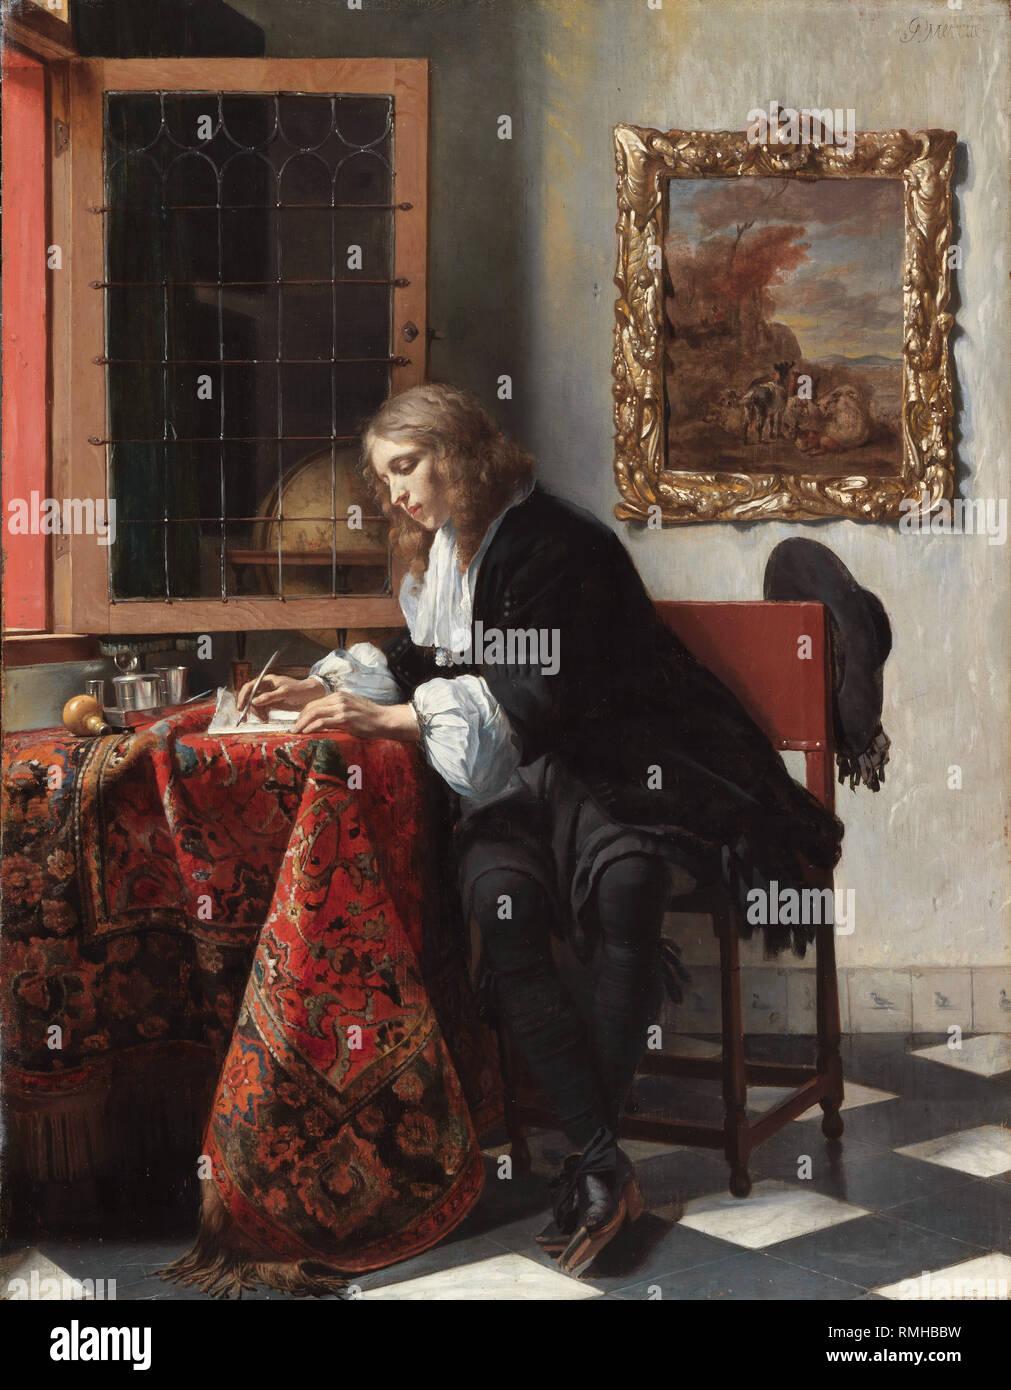 Man writing a letter, by Gabriël Metsu, Man writing a letter, by Gabriël Metsu - Stock Image